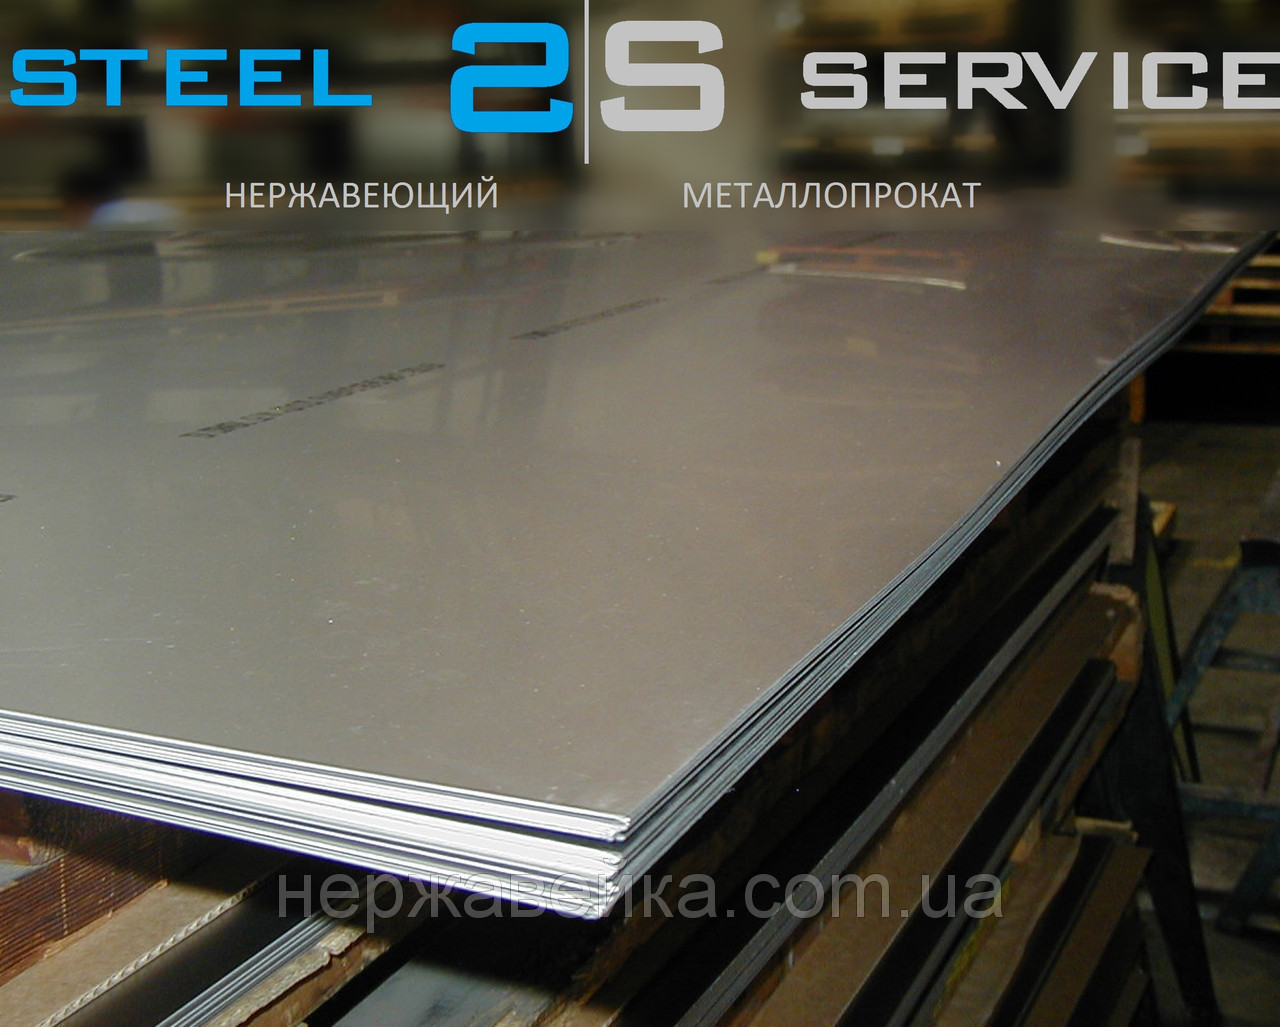 Нержавеющий лист 0,8х1000х2000мм  AISI 316L(03Х17Н14М3) BA - зеркало,  кислотостойкий